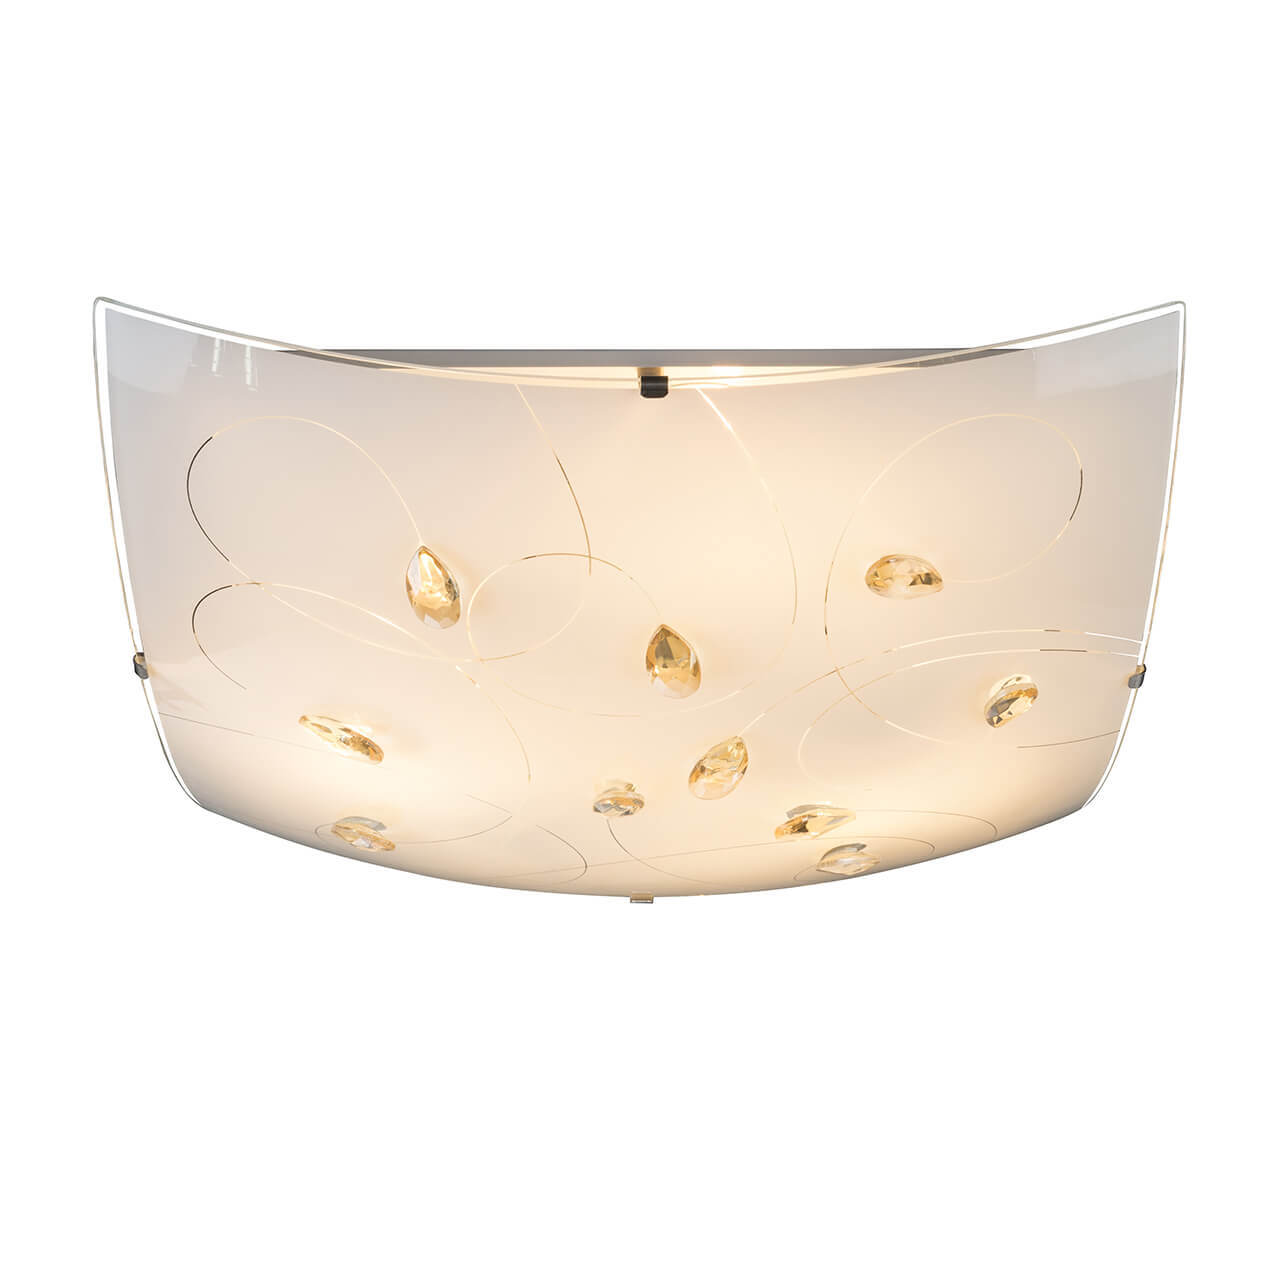 Настенно-потолочный светильник Globo Taveuni 40393-3 настенно потолочный светильник спот коллекция dante 57994 1 хром globo глобо